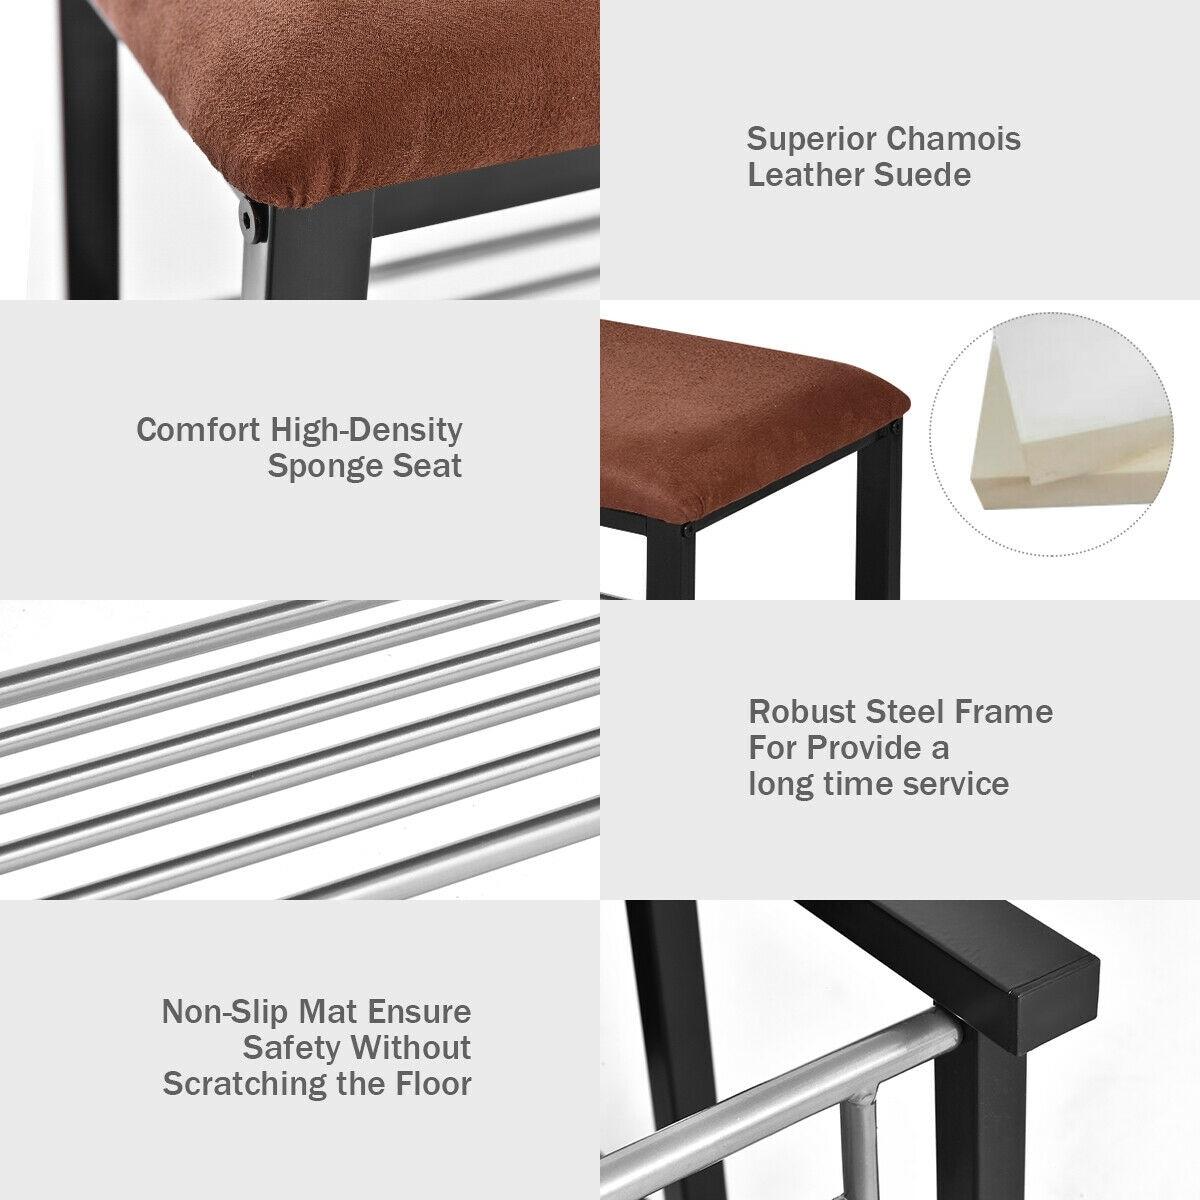 e8c6da00fc Shop Costway 2 Tier Shoe Storage Rack Bench Shelf Soft Seat Stool Organizer  Entryway Furni - as pic - Free Shipping Today - Overstock - 17647559